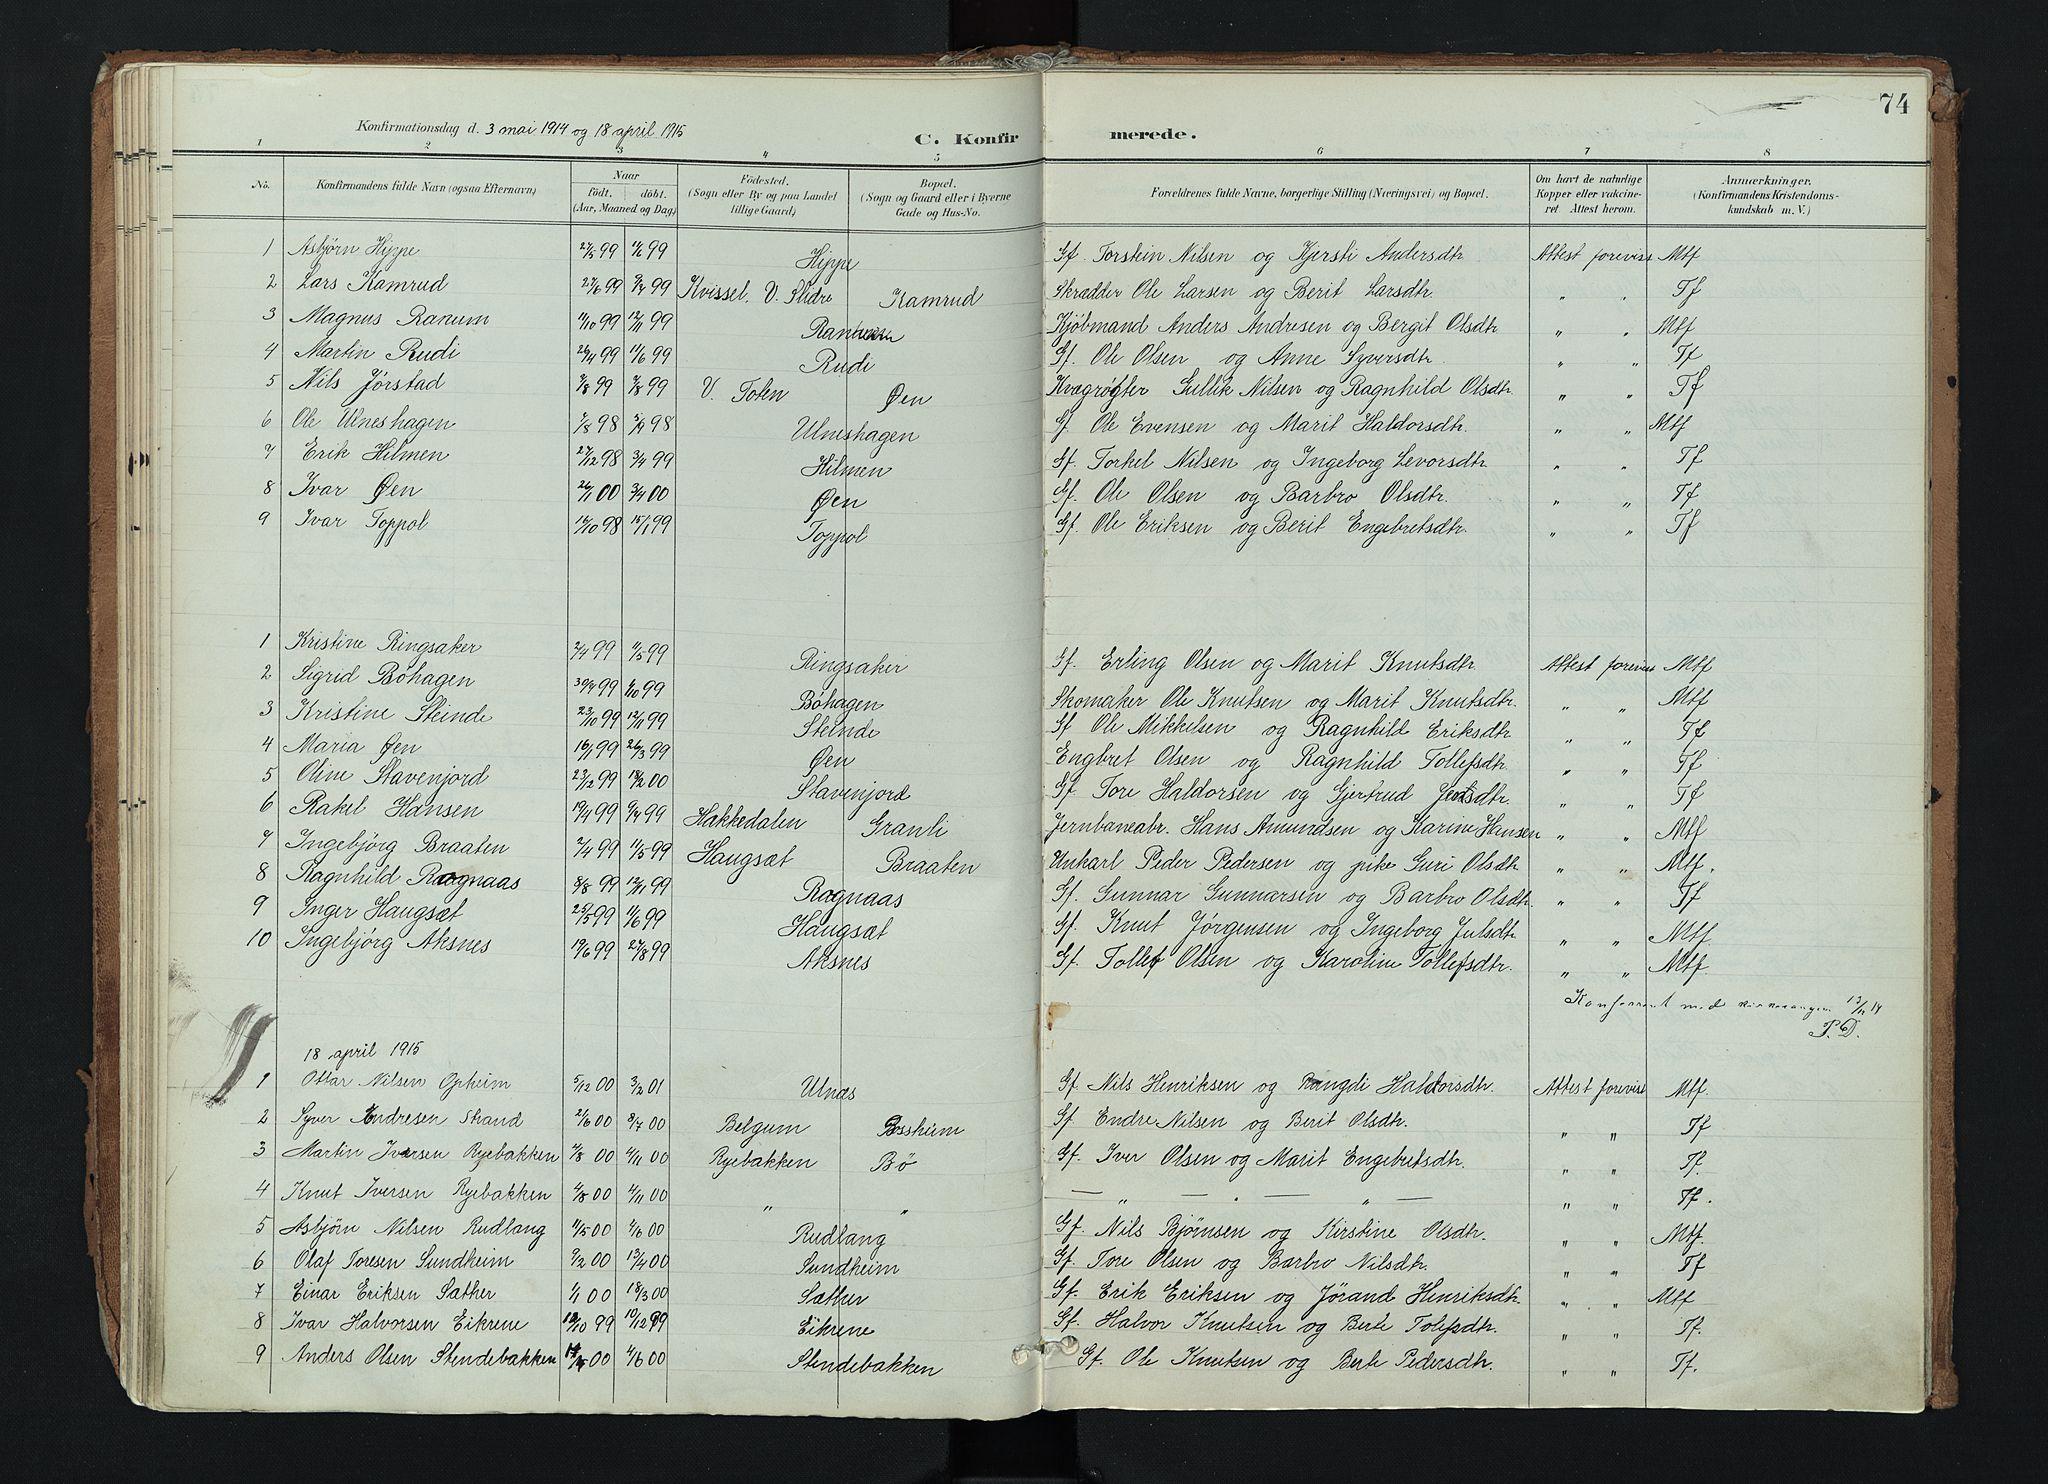 SAH, Nord-Aurdal prestekontor, Ministerialbok nr. 17, 1897-1926, s. 74